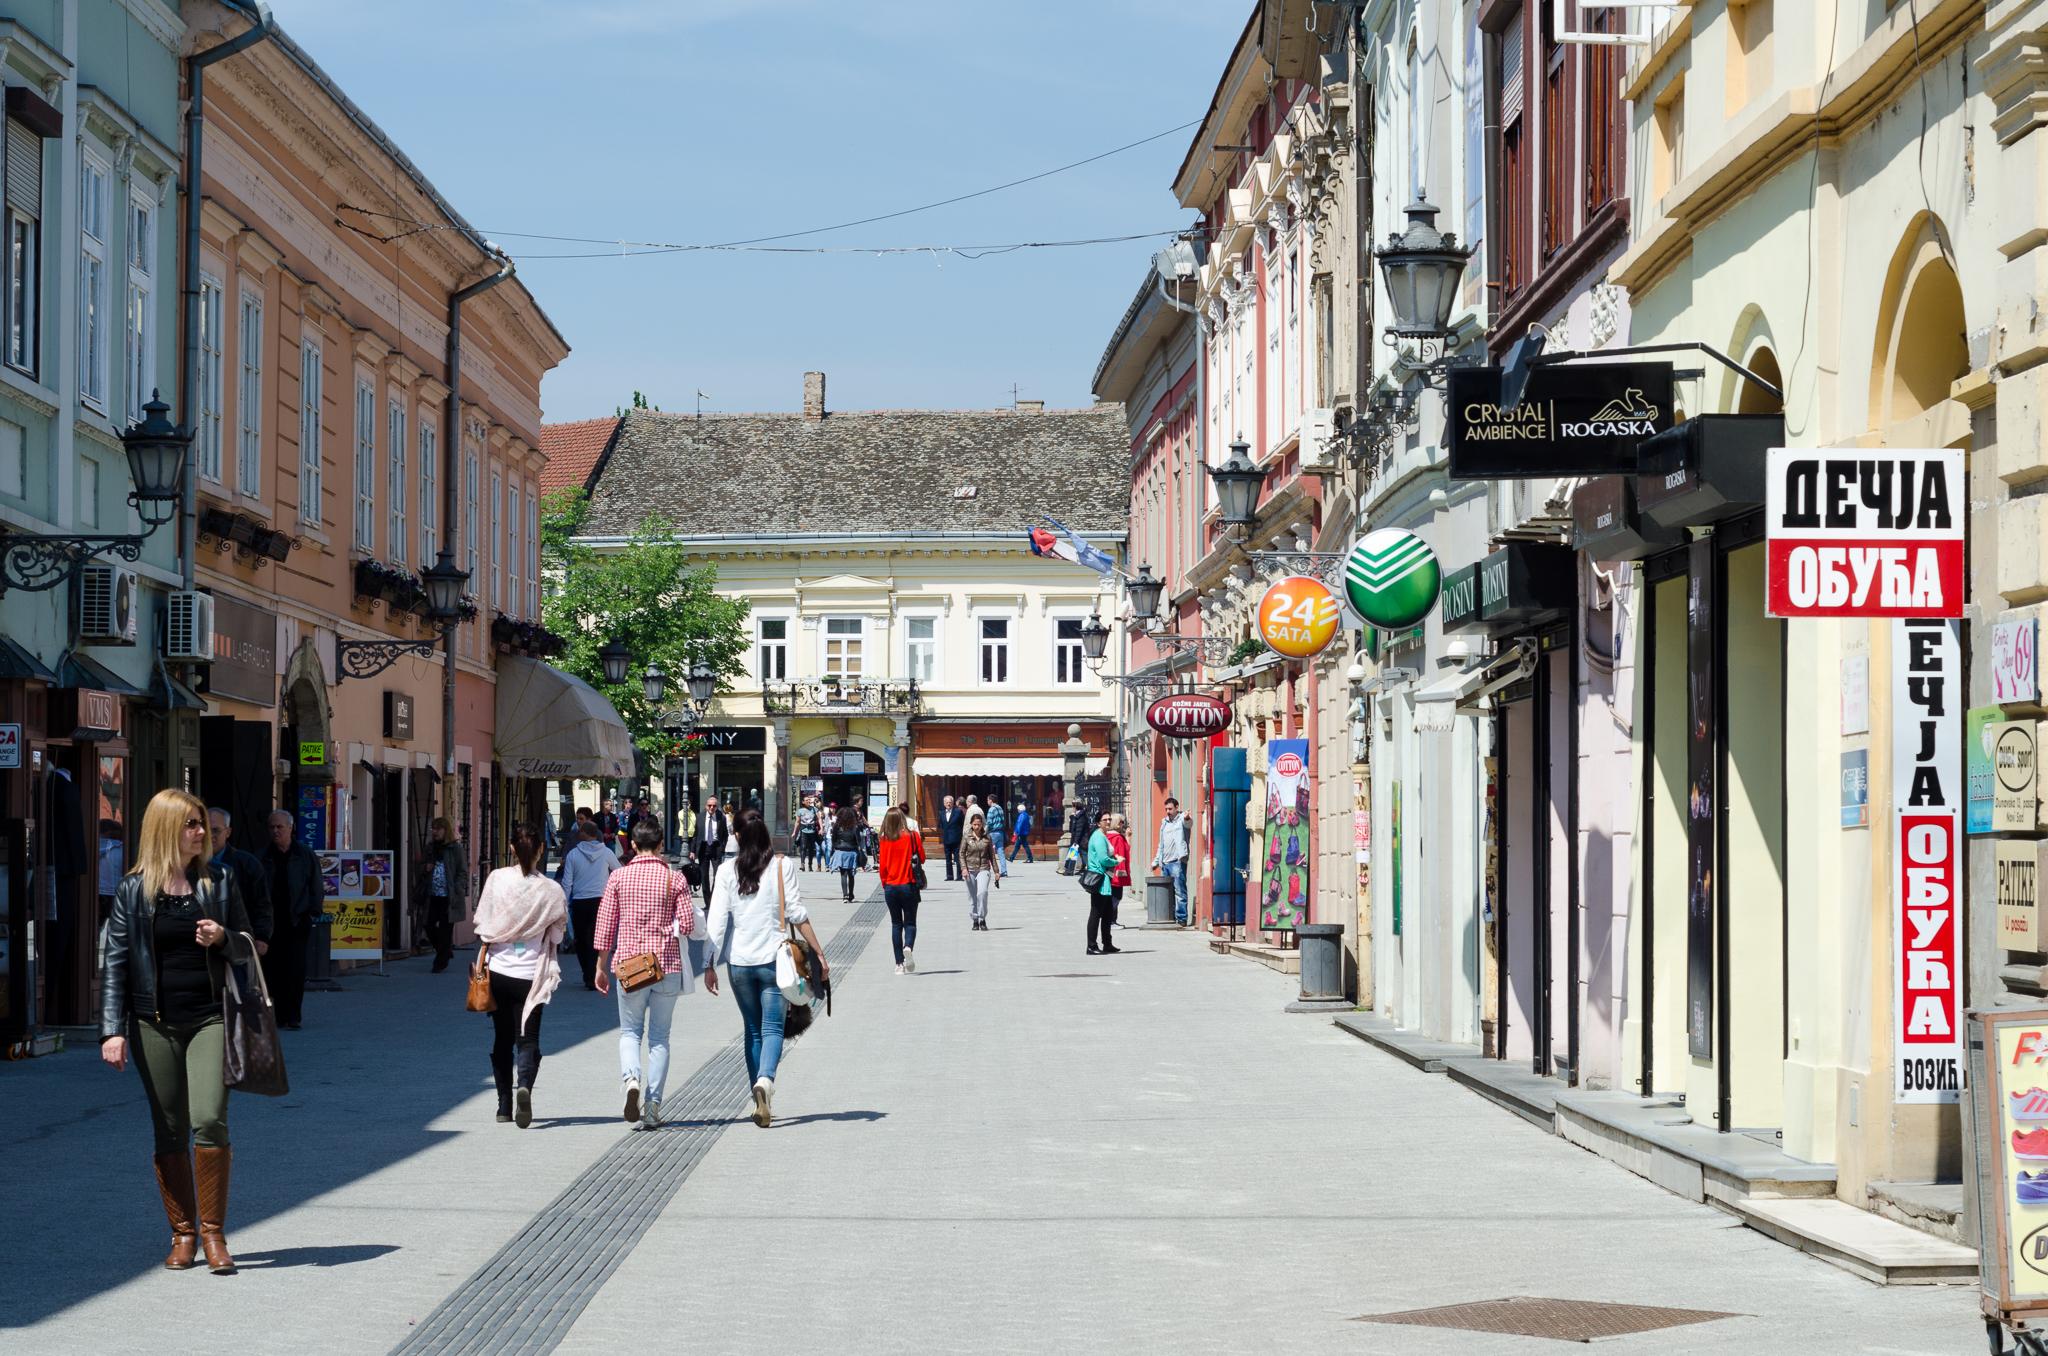 ulice novog sada mapa The most important city streets | I love Novi Sad ulice novog sada mapa